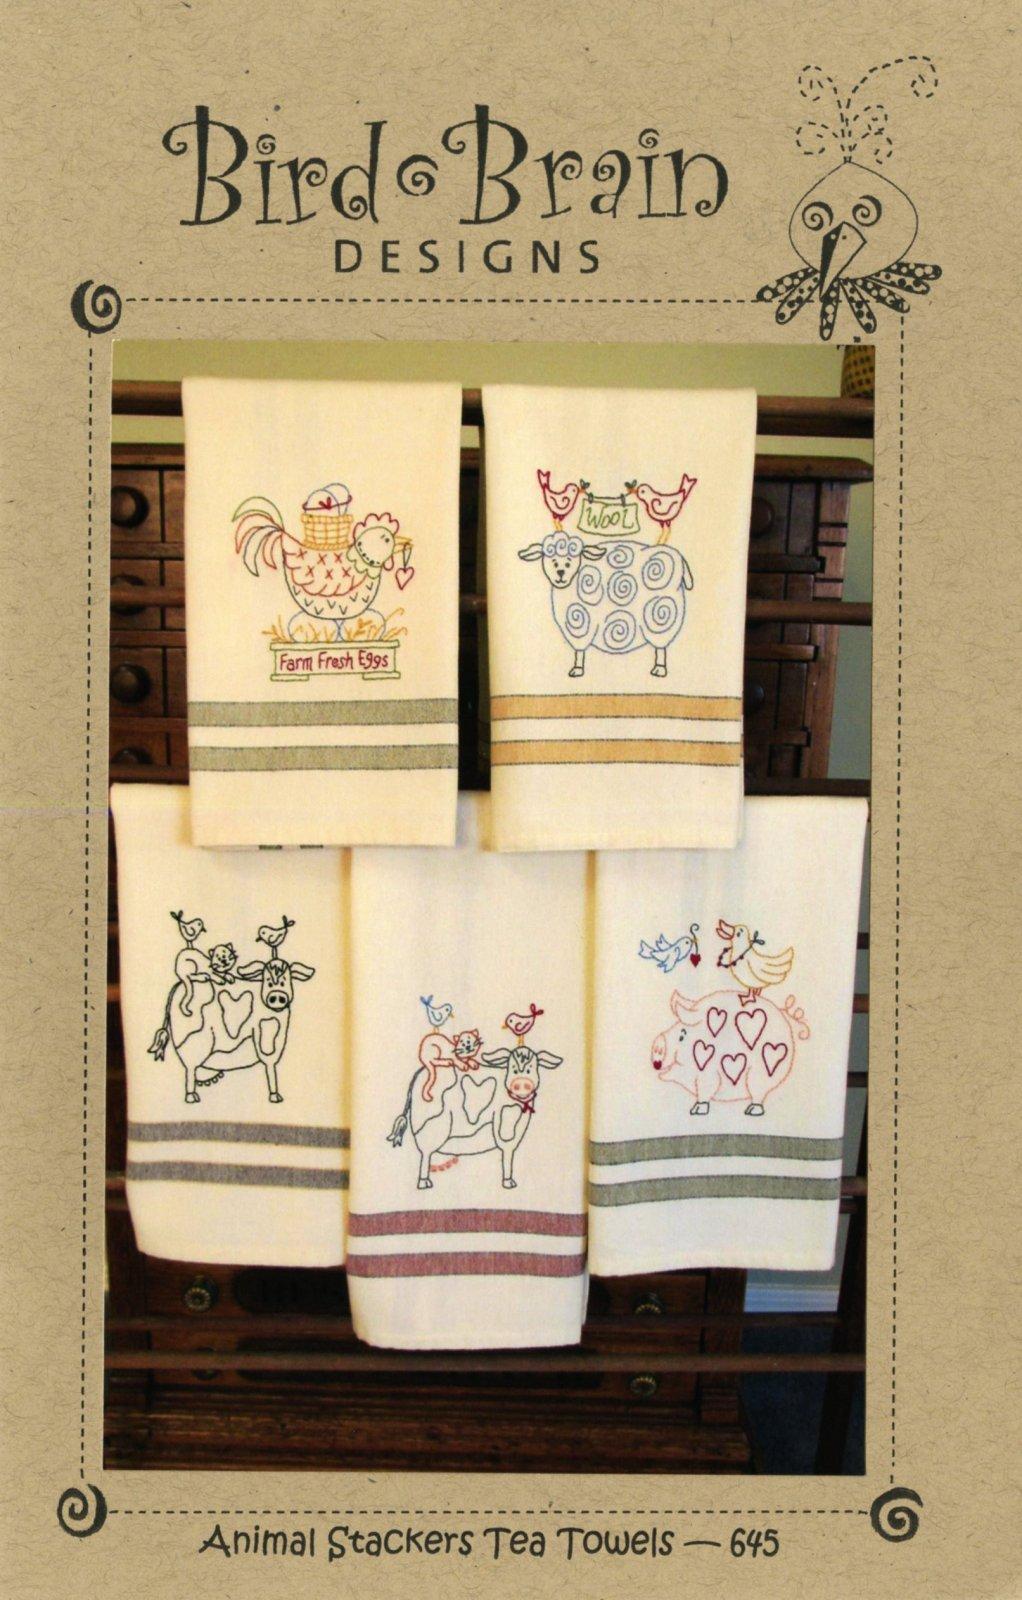 Animal Stackers Tea Towels